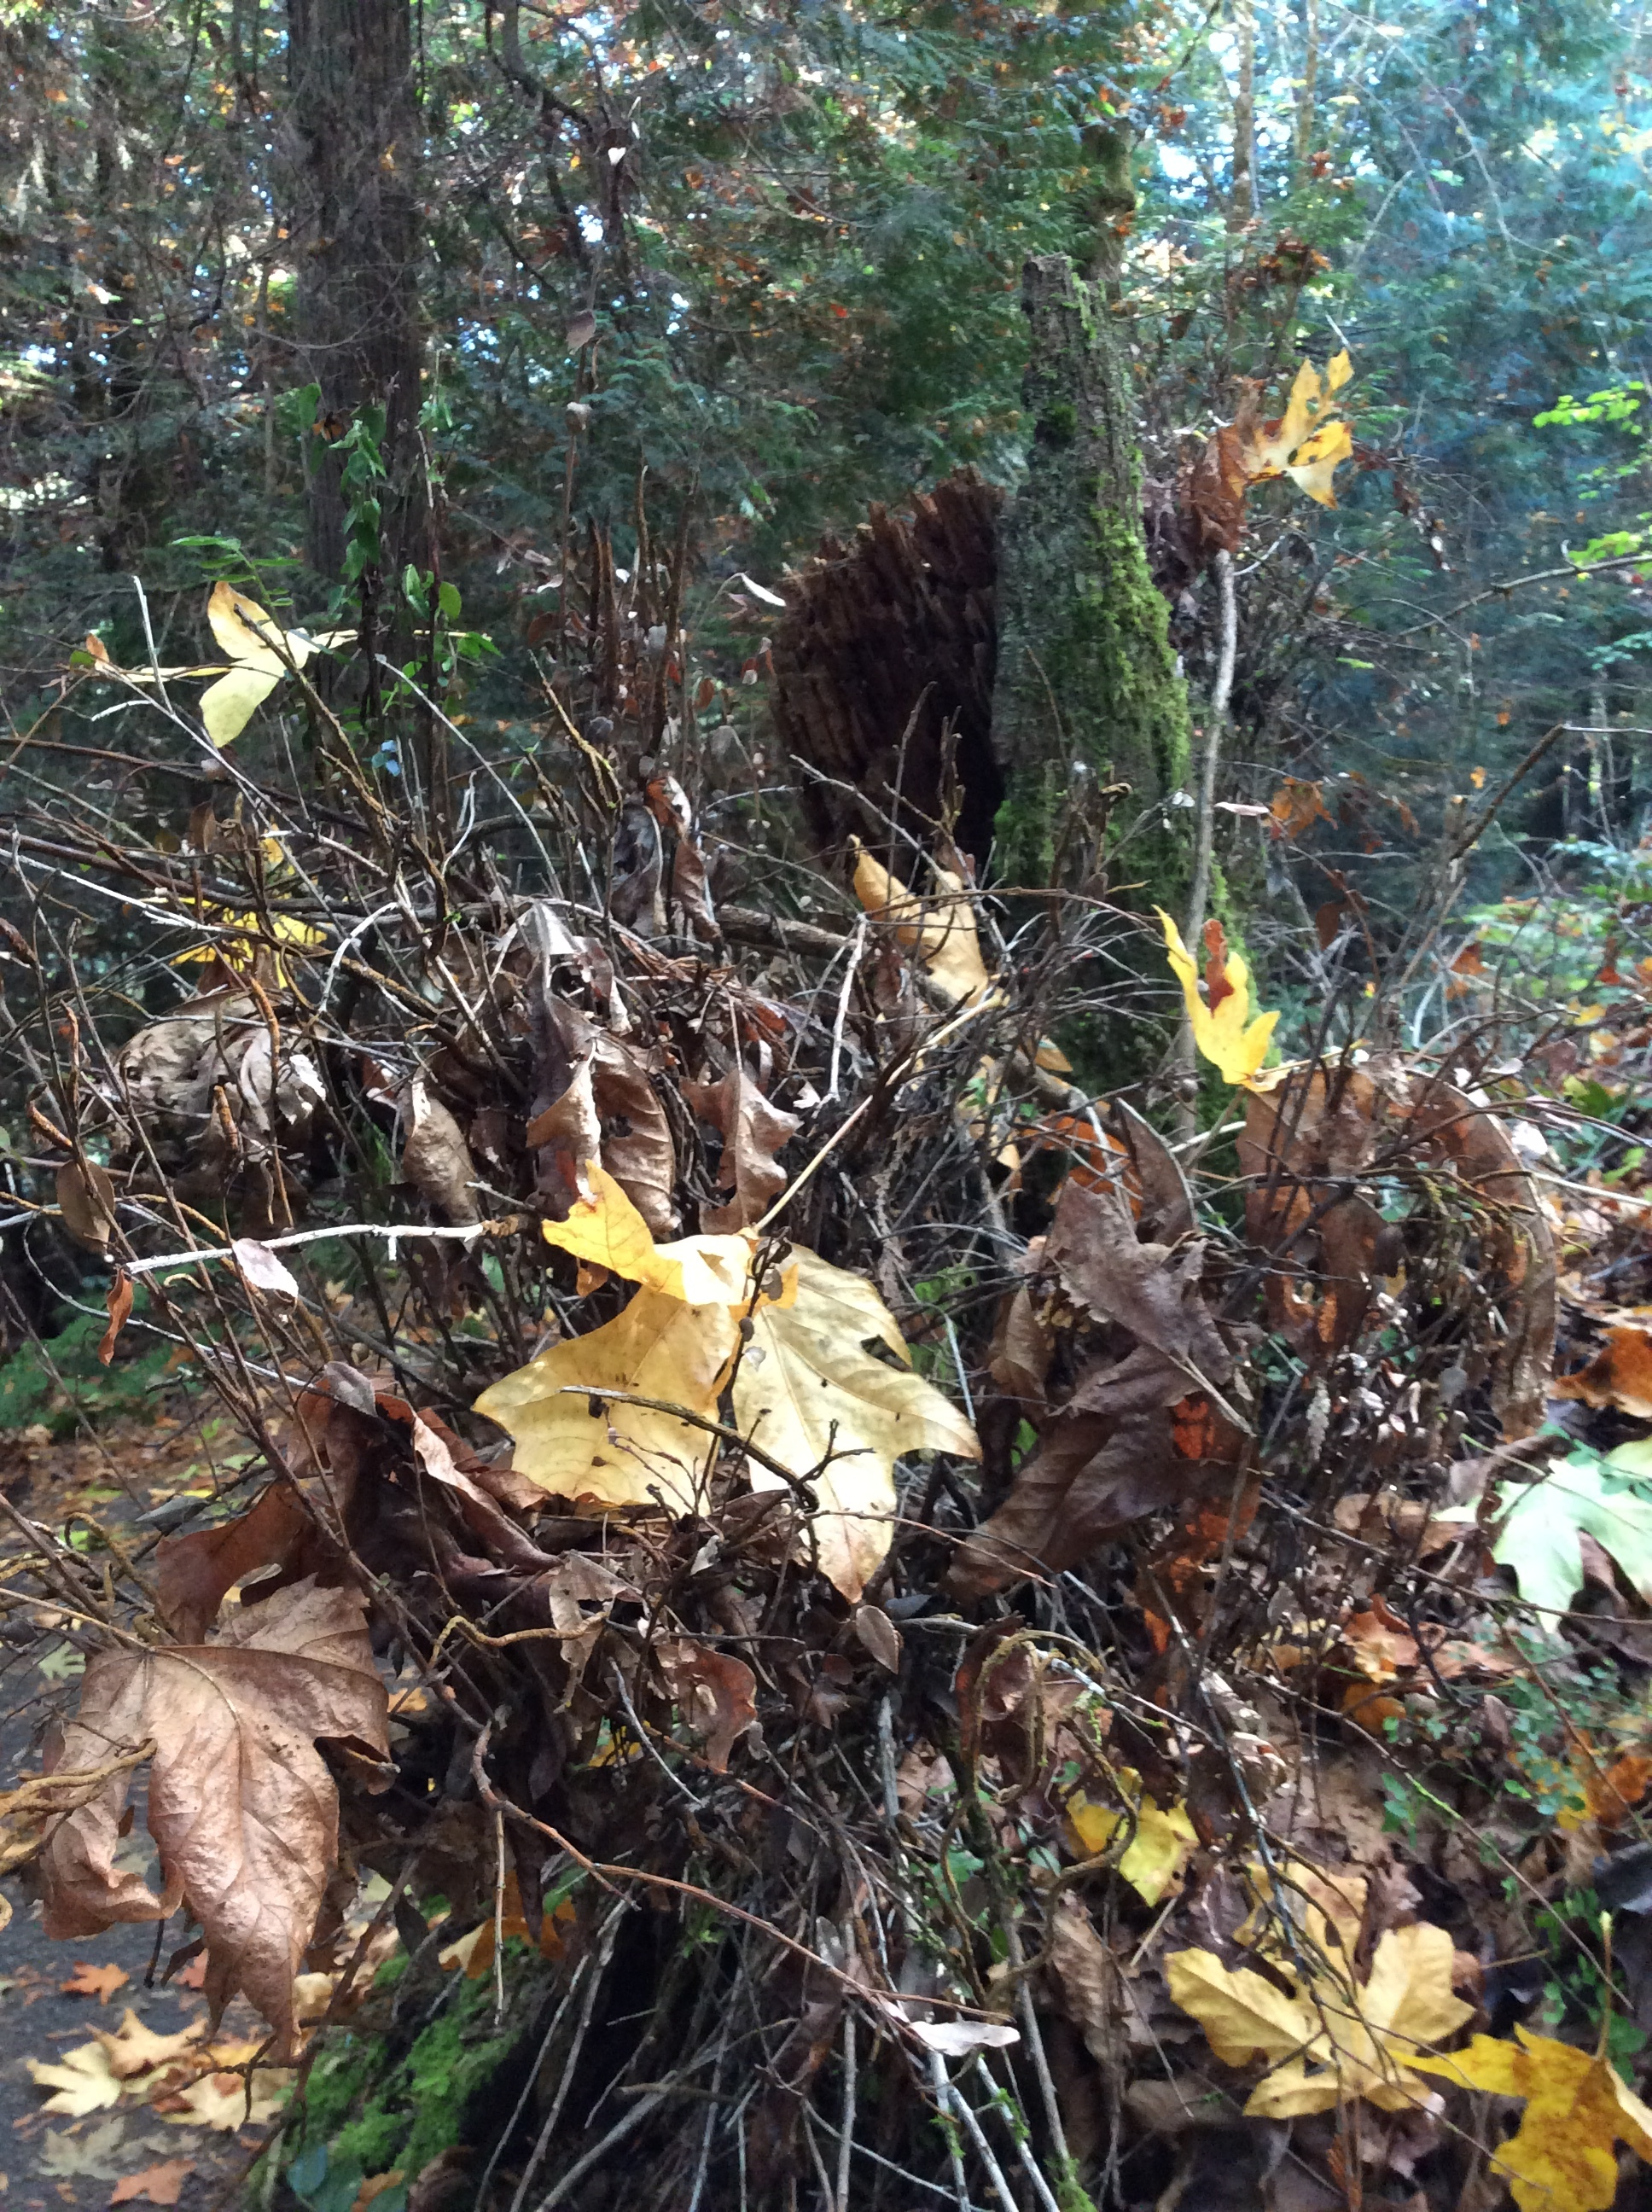 Nature is messy too. Bainbridge Island, Oct 2017.